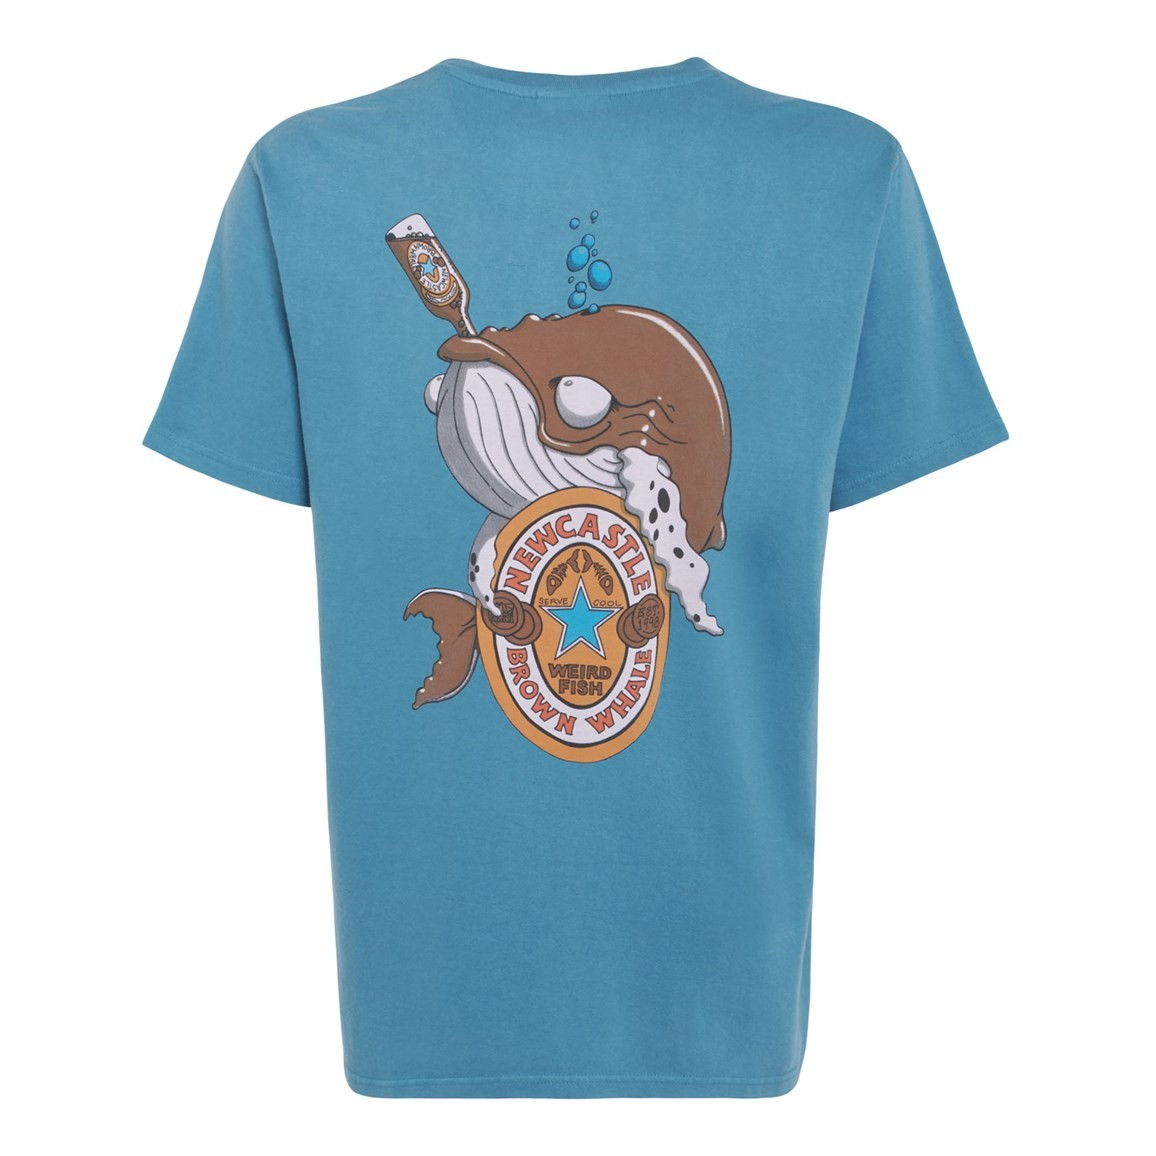 Brown Whale Printed Artist T-Shirt Adriatic Blue